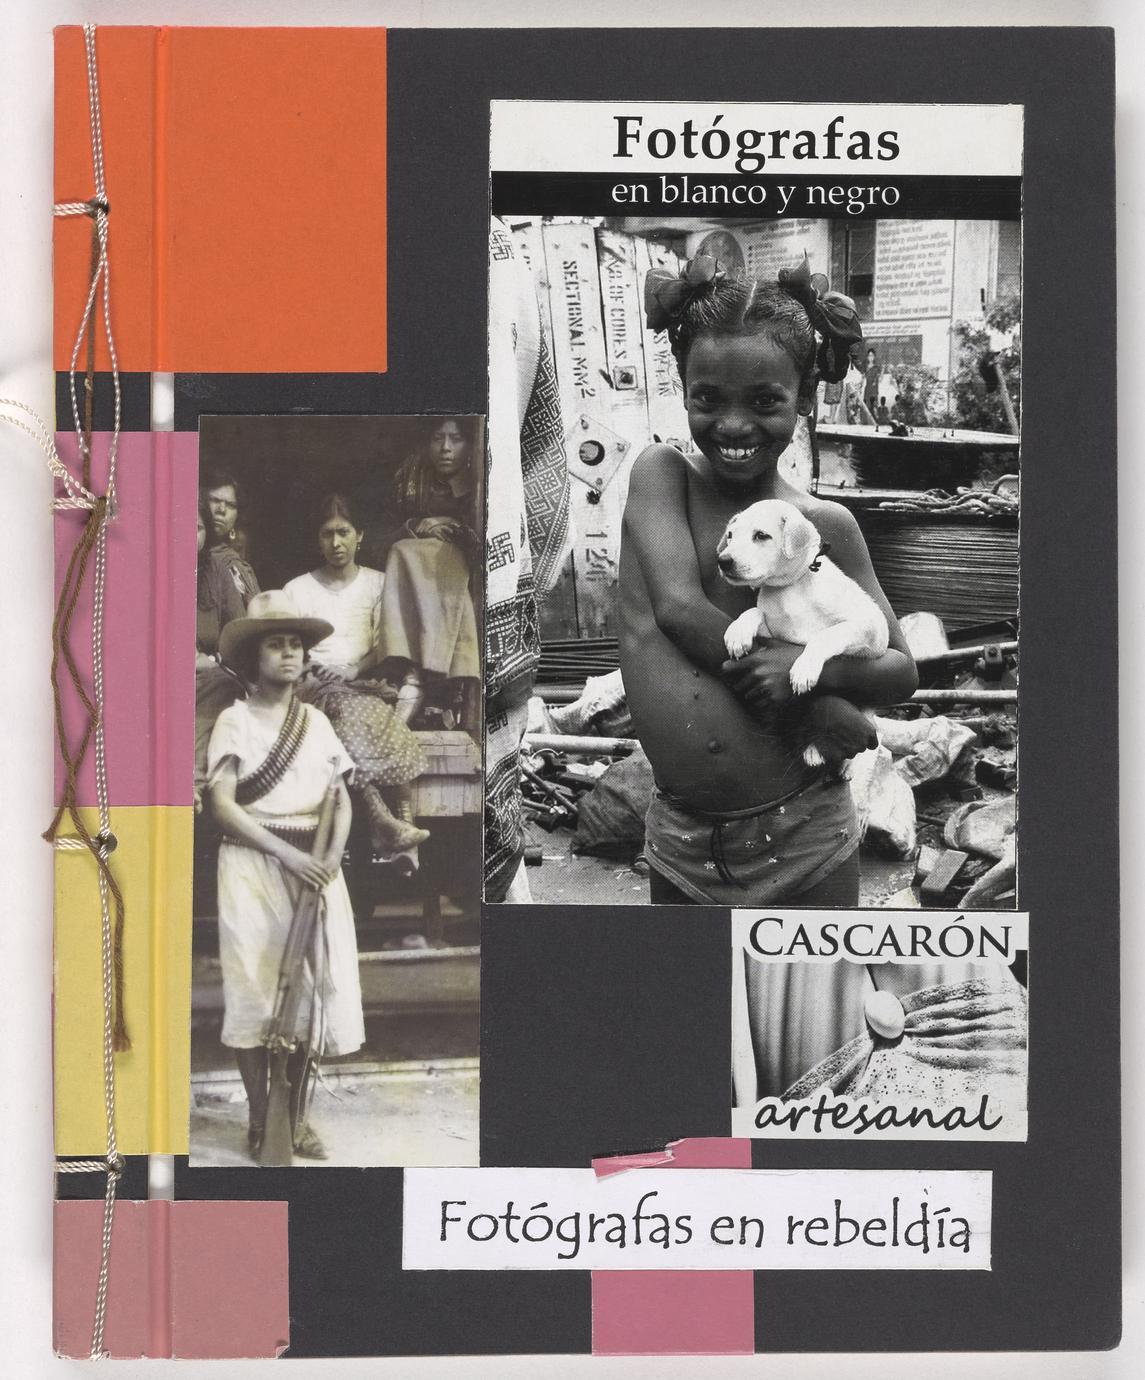 Fotógrafas en rebeldía (1 of 3)